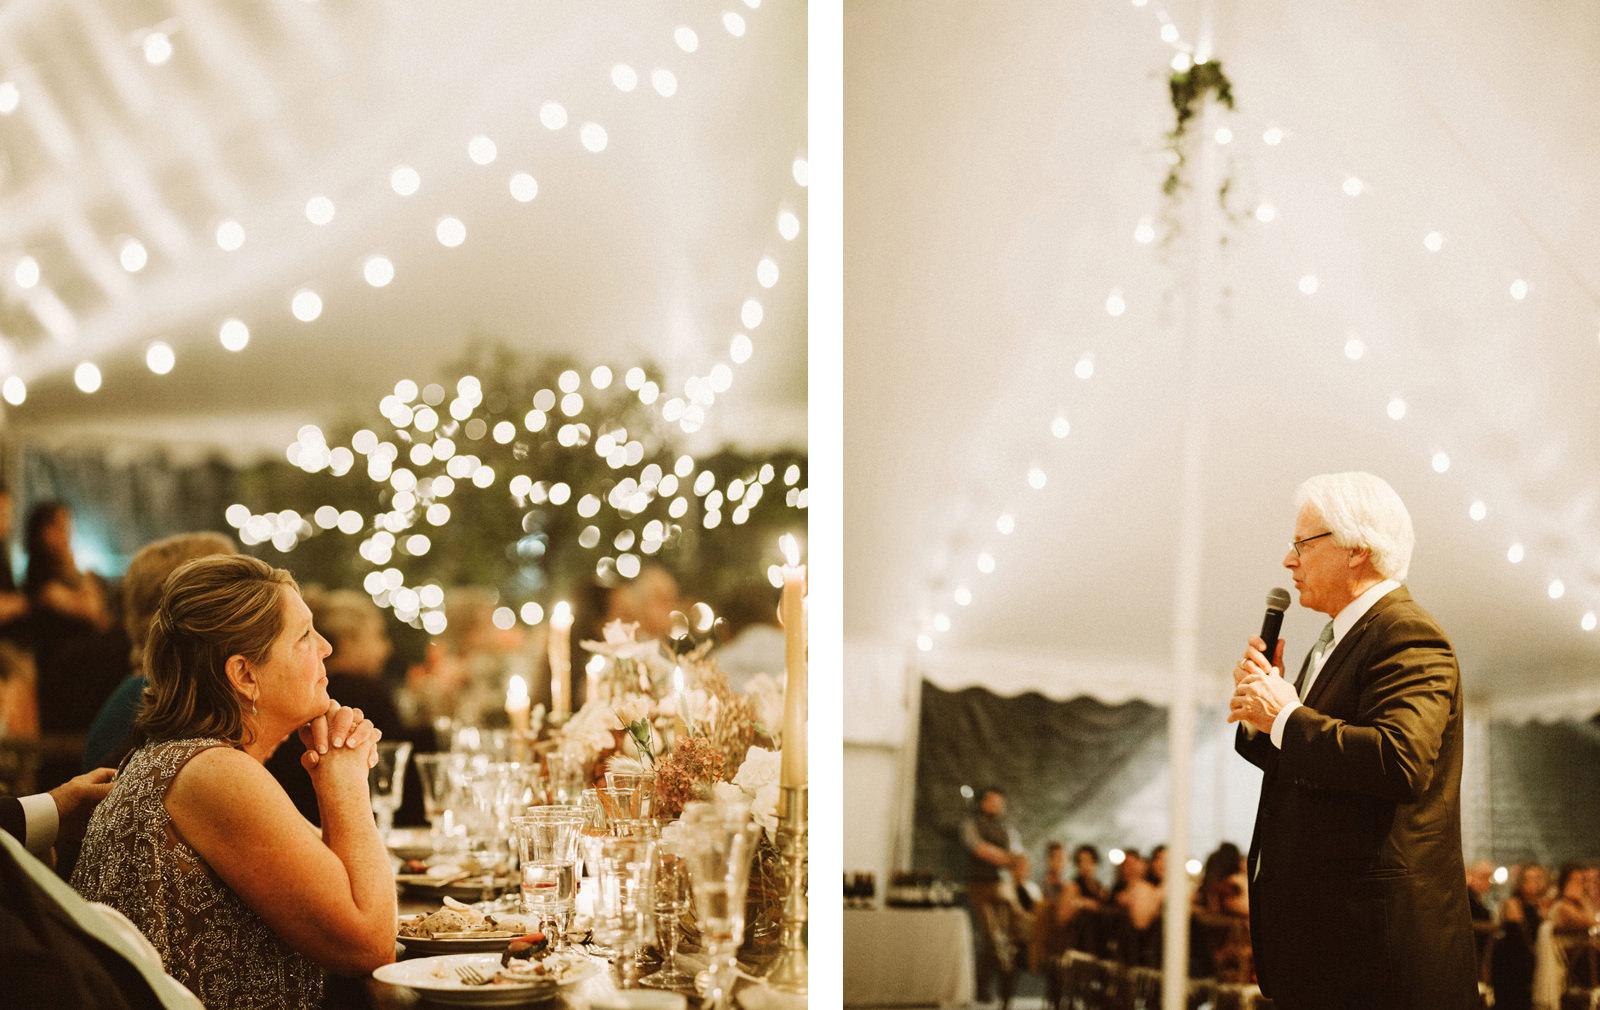 bridgeport-wedding-154 BRIDGEPORT, CONNECTICUT BACKYARD WEDDING